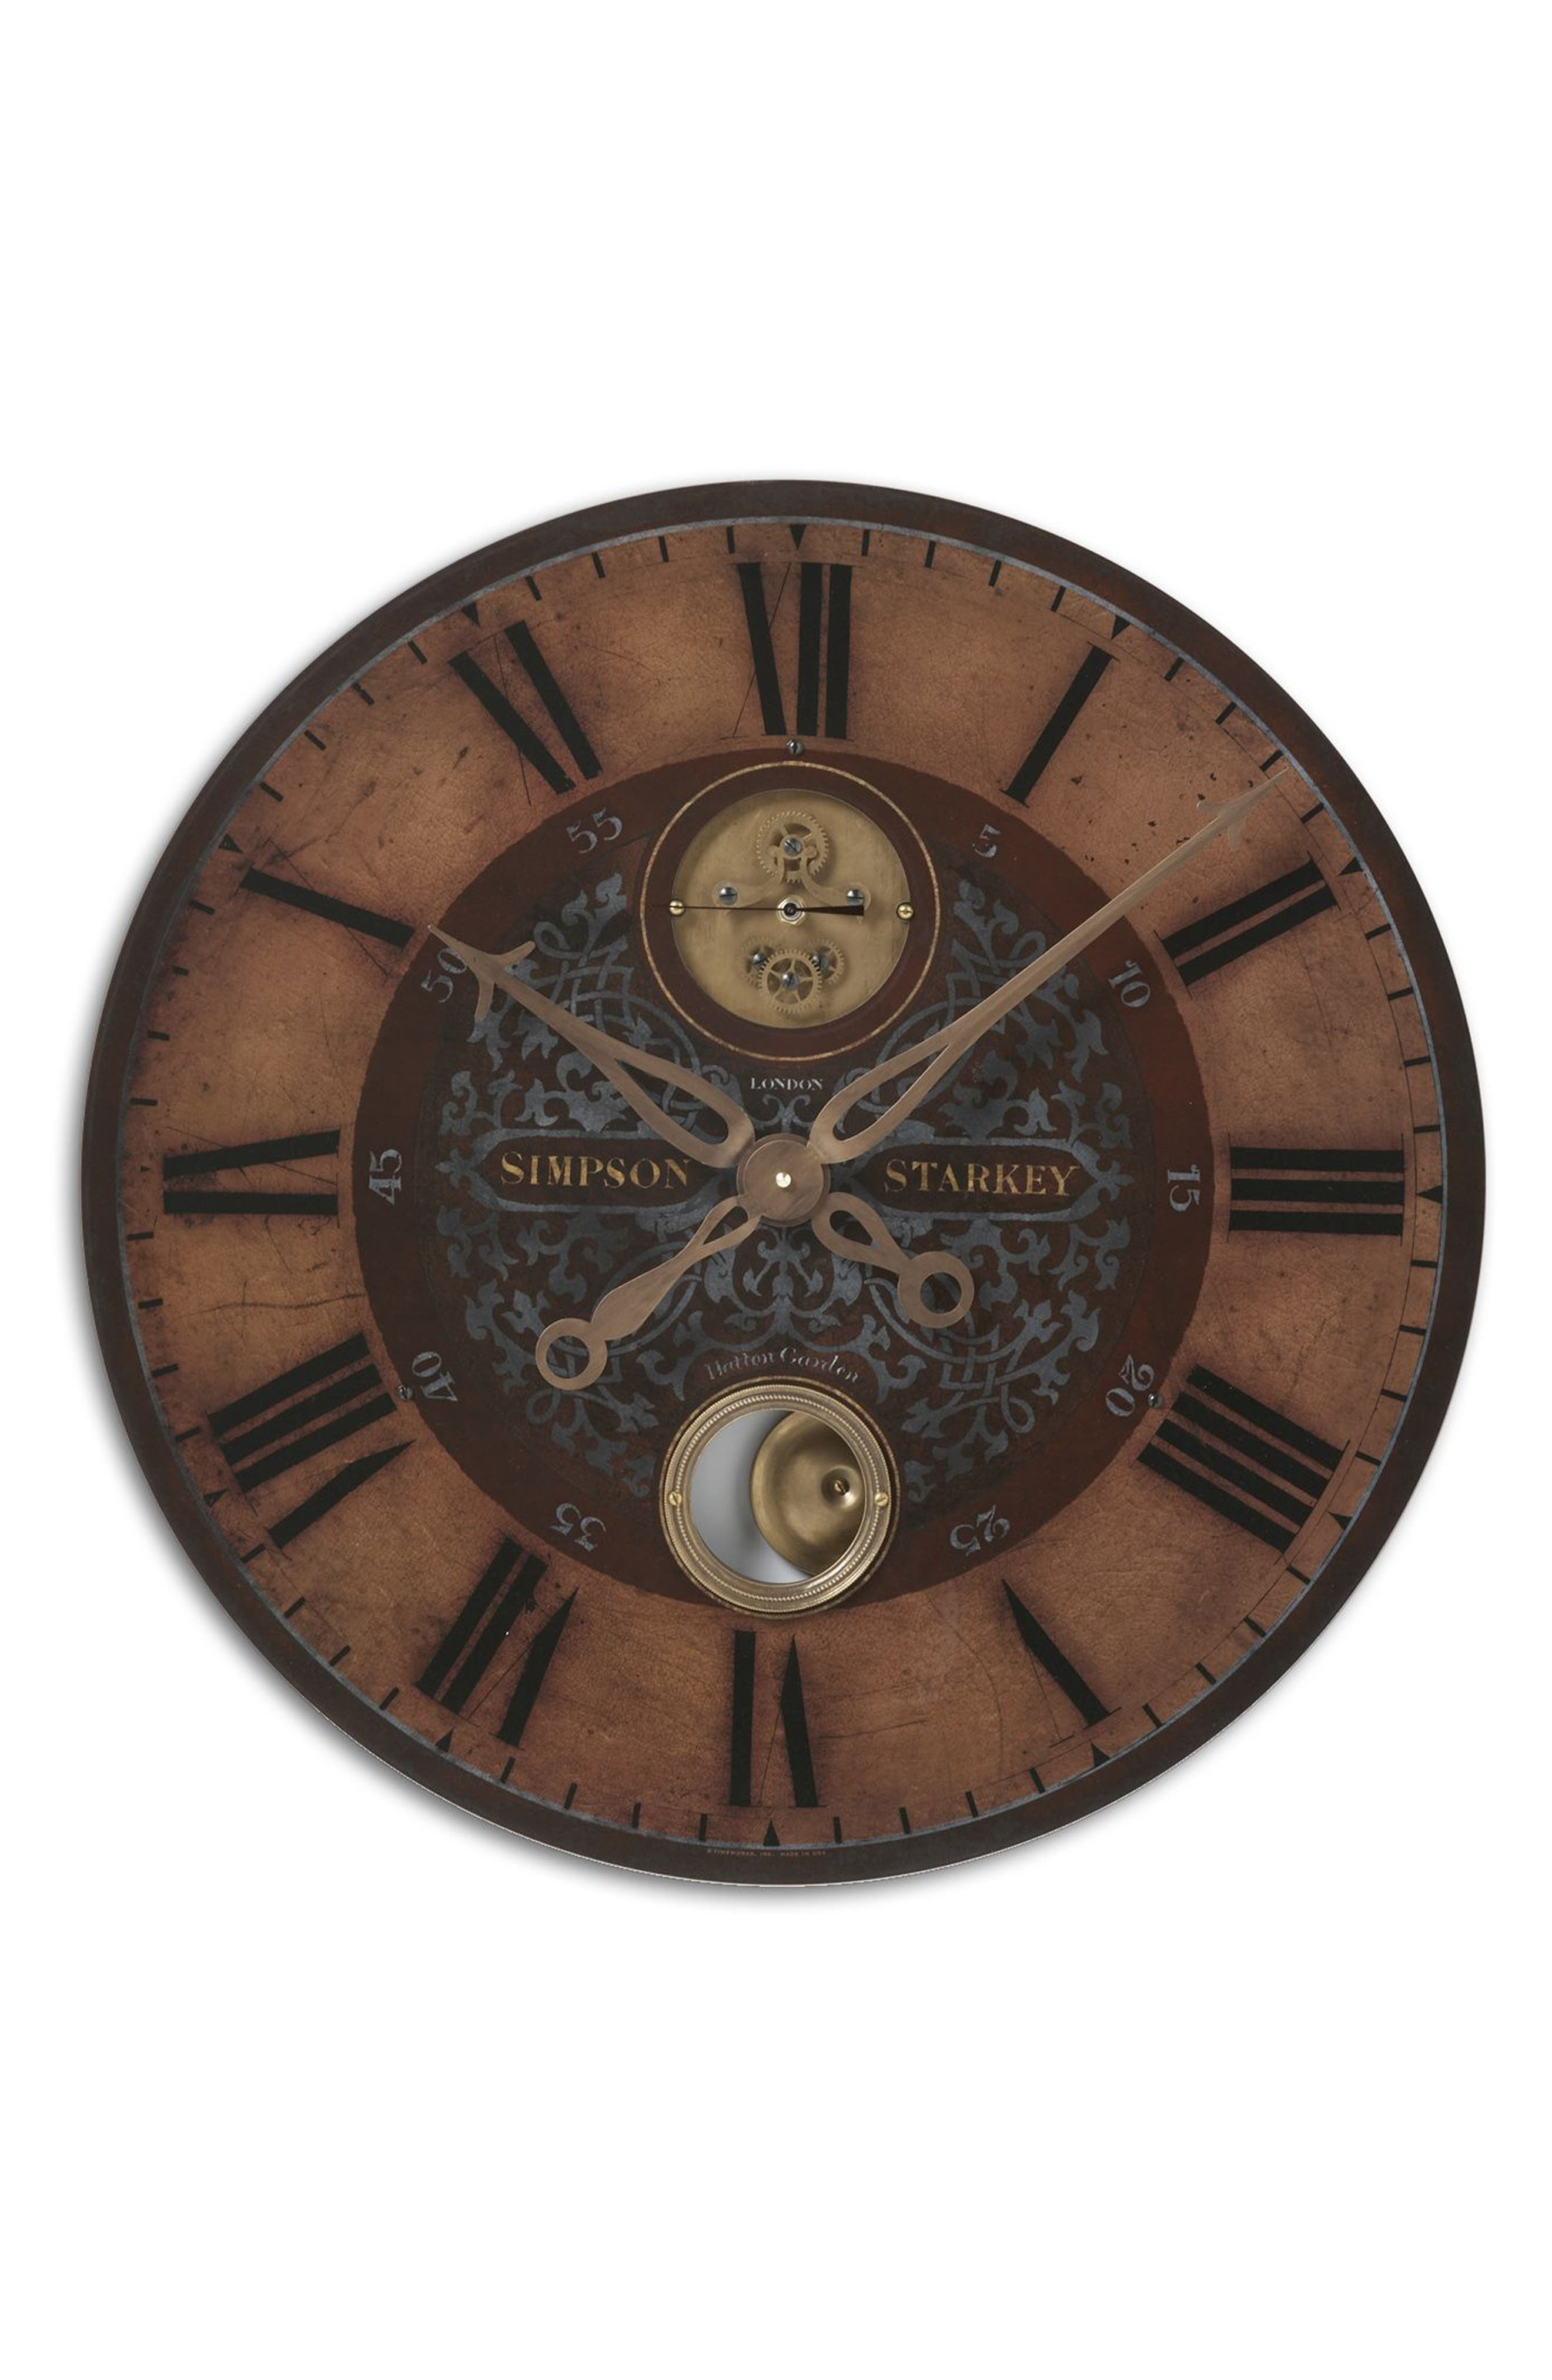 Main Image - Uttermost Simpson Starkey Wall Clock